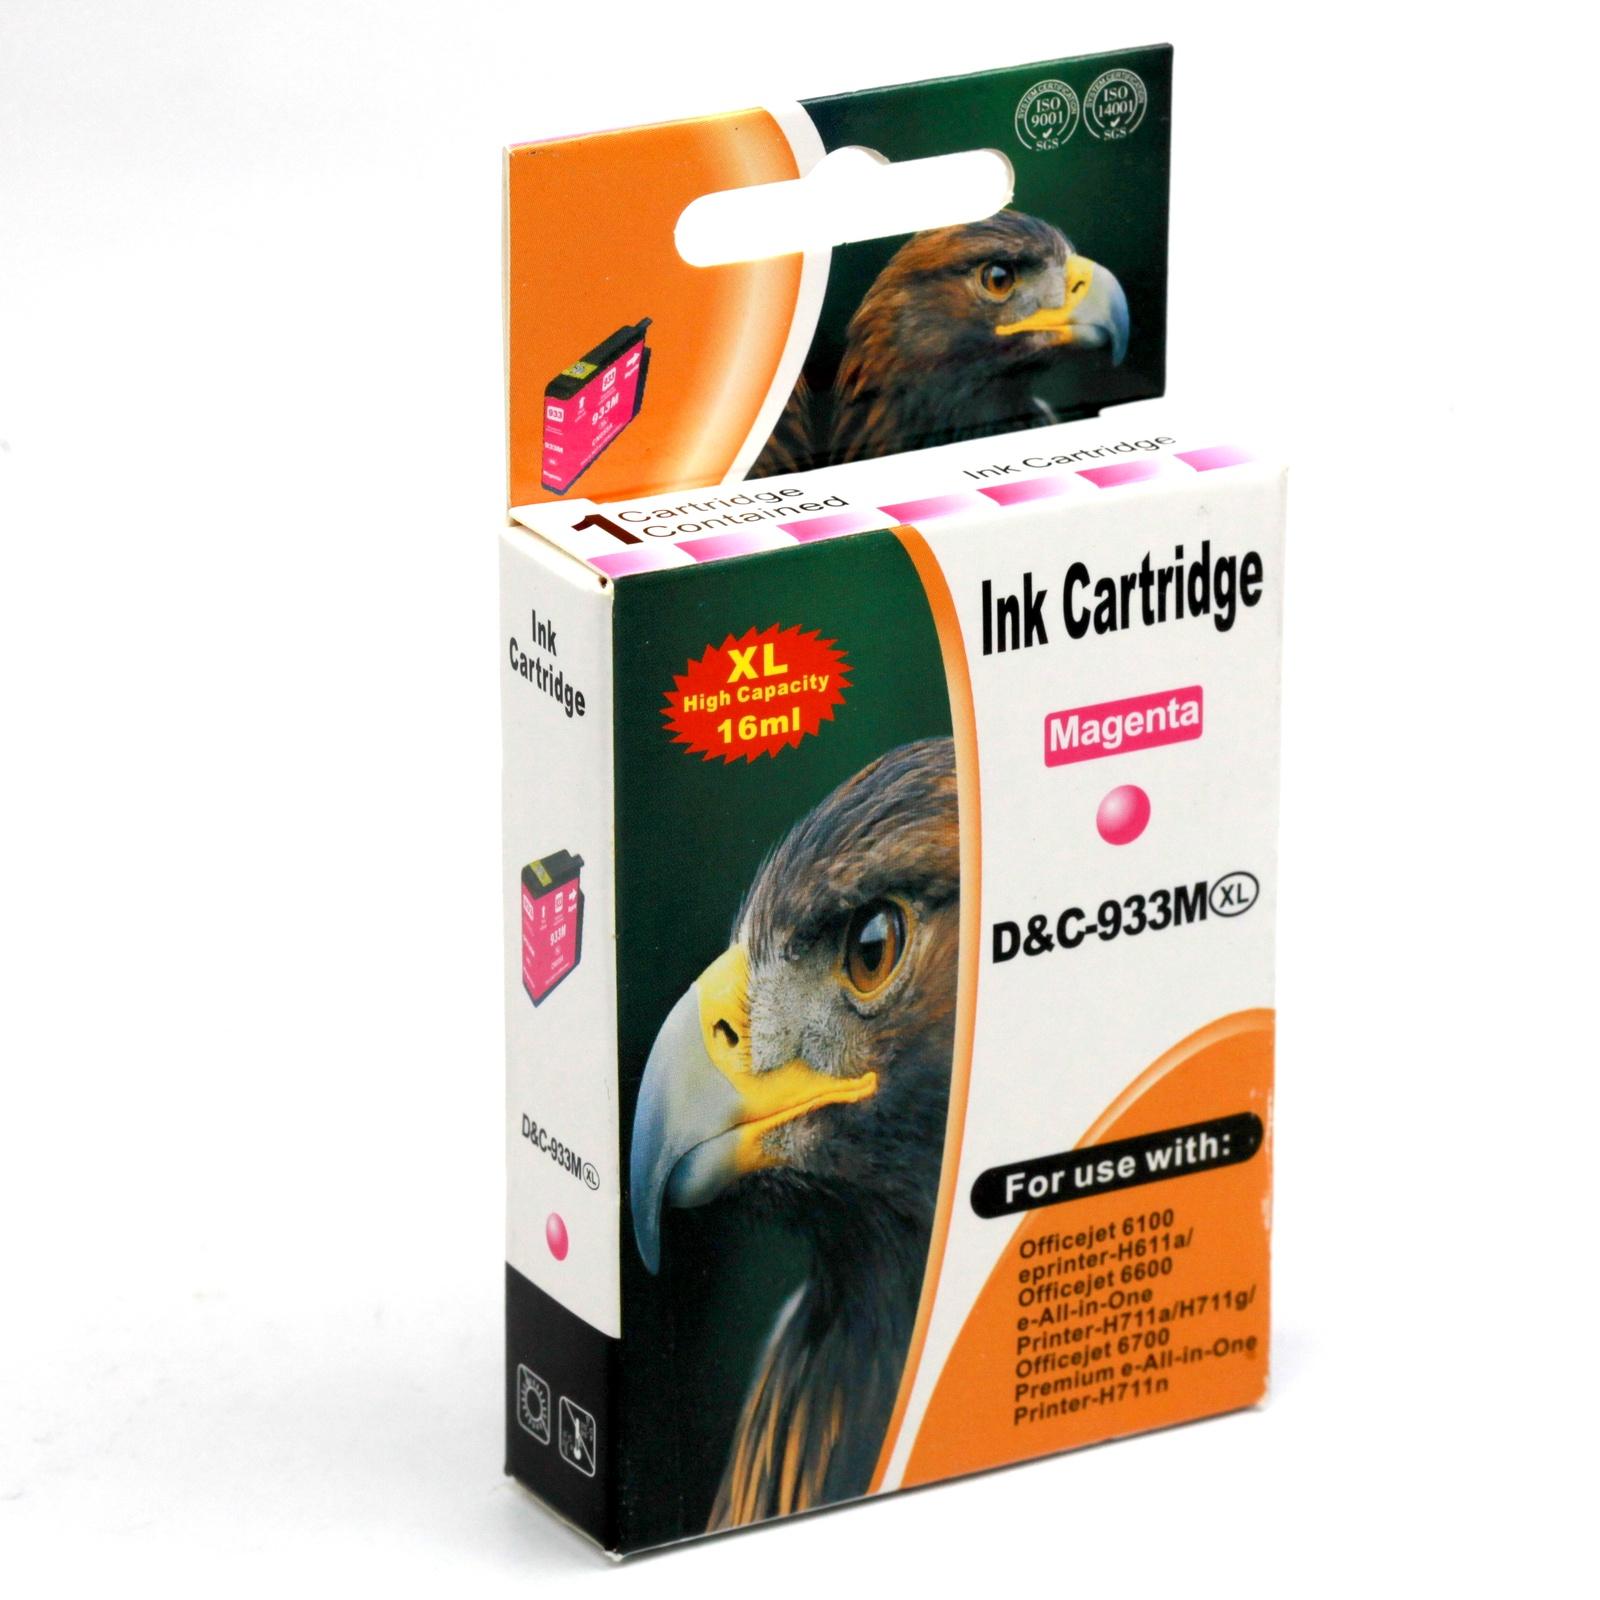 Картридж INKO HP 933 XL OfficeJet 6100, 6600, 6700, 7110, 7610, 7612, 7510 пурпурный printer 7612 hp